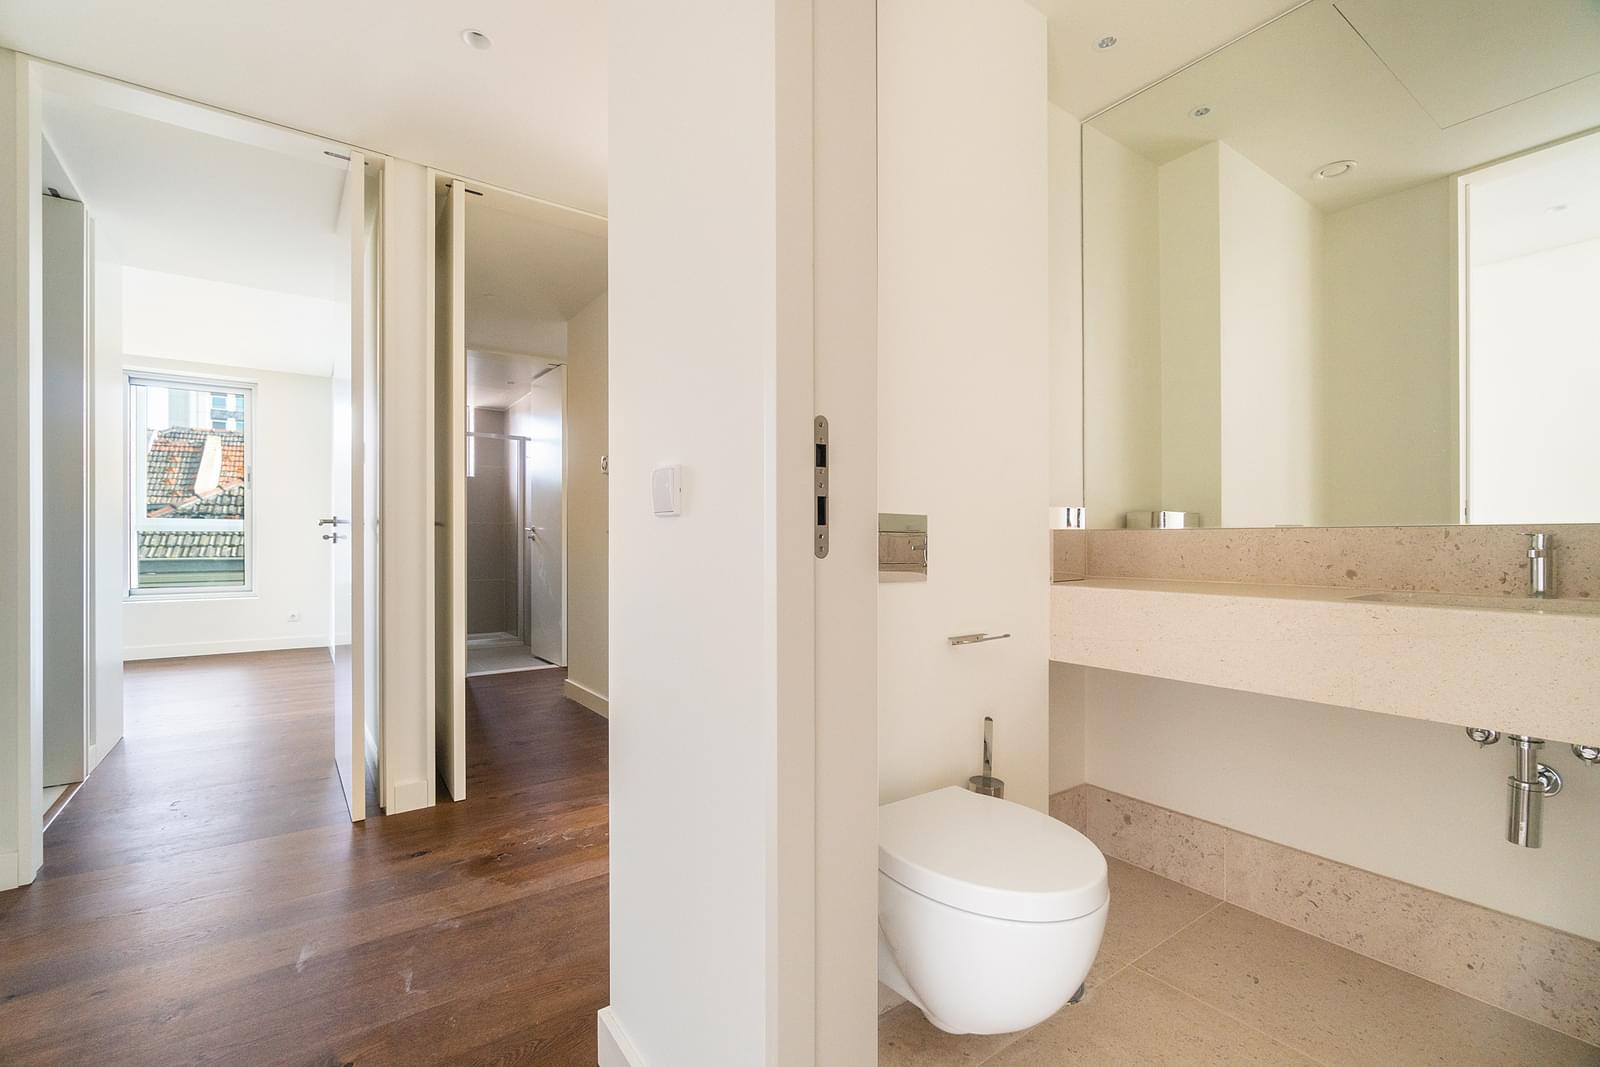 pf18694-apartamento-t3-lisboa-f8de20e8-cc9a-4cac-b026-18654c6e3fc7